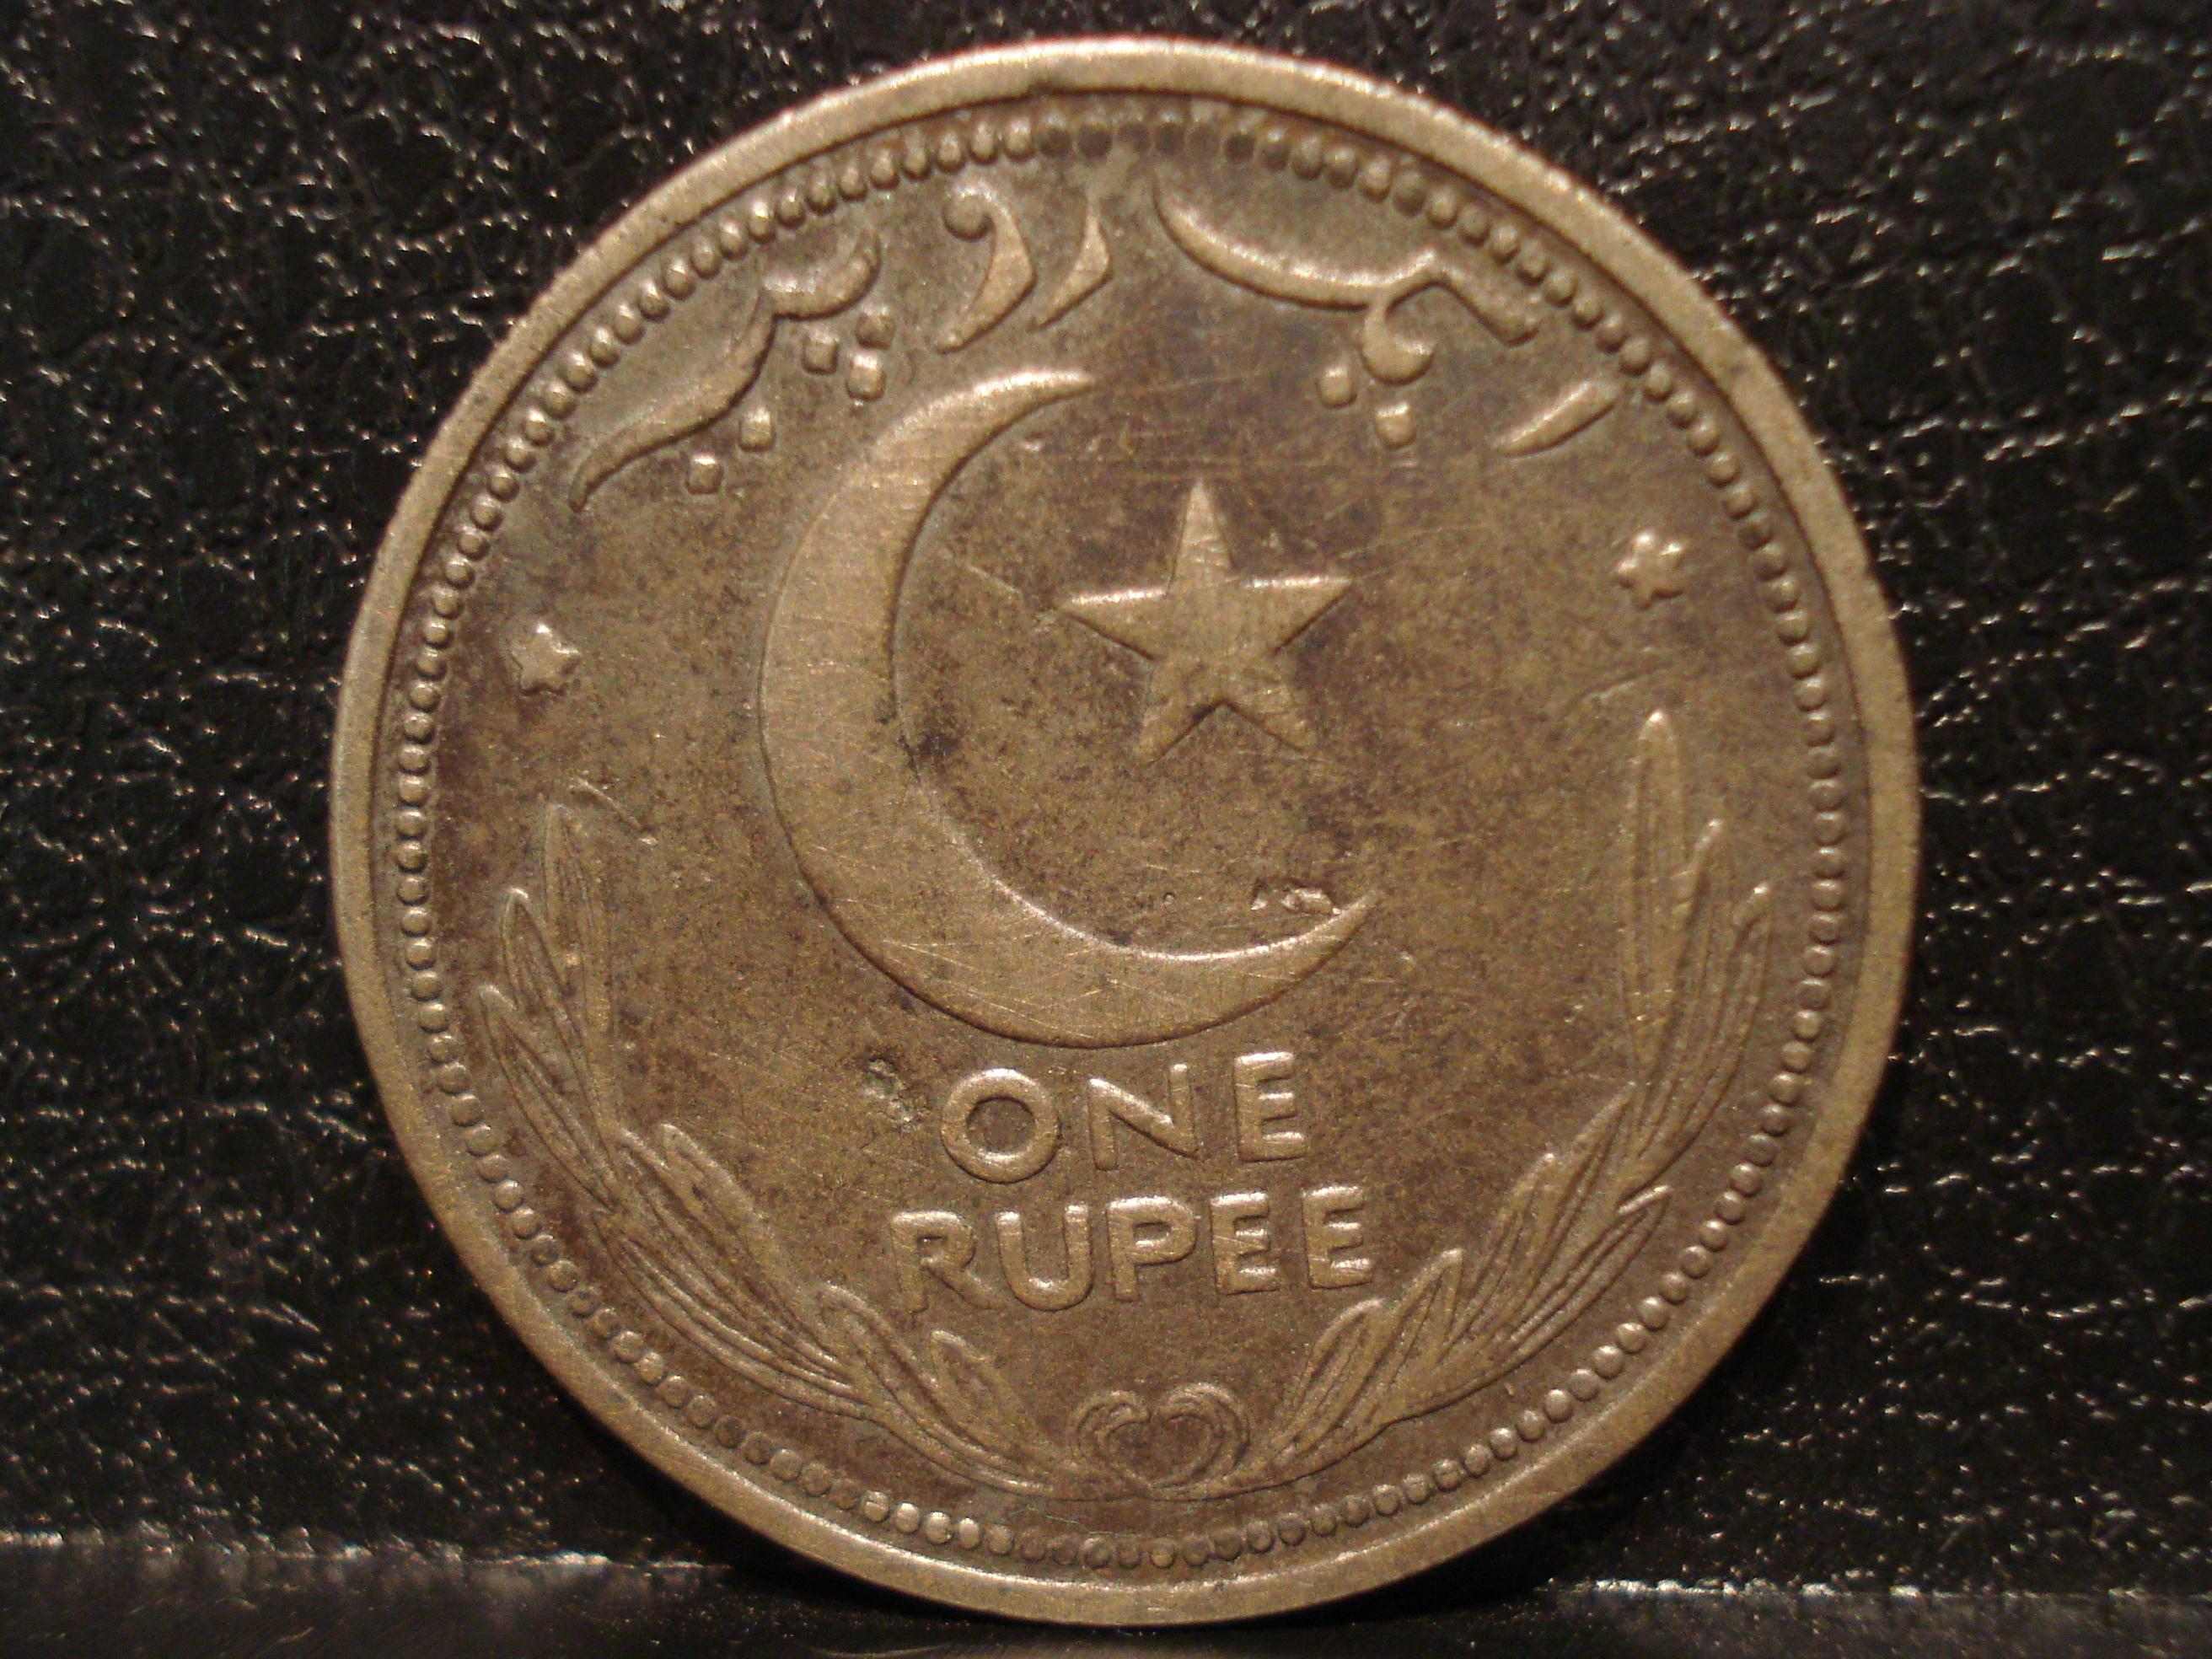 Pakistani Coins 2012 ملف:Pakistani one r...